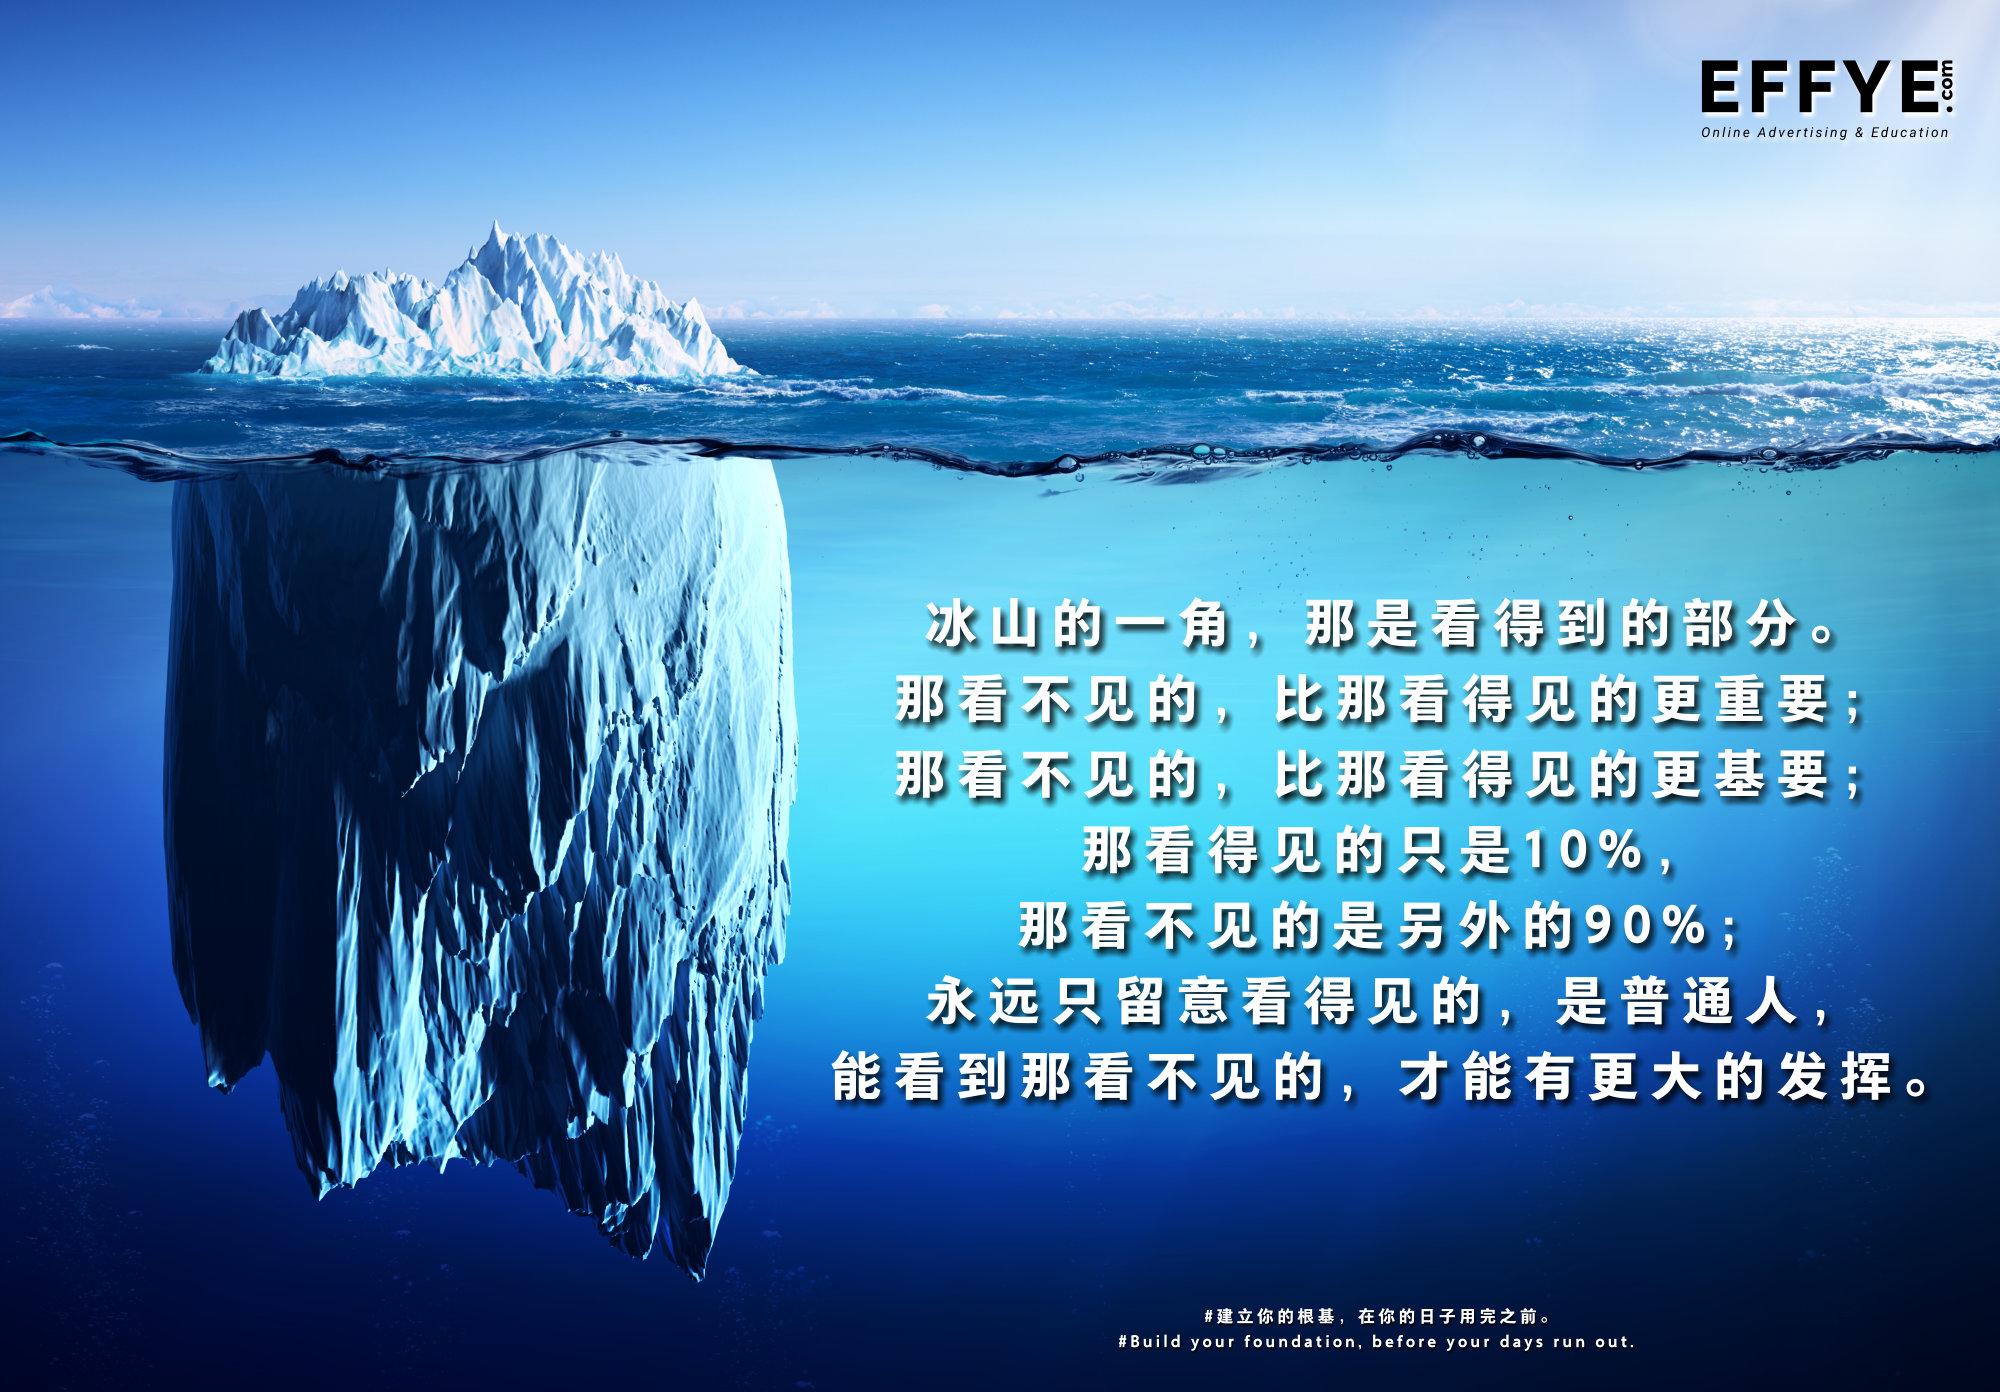 Effye Media 网络宣传 网络广告 网络发布 网络营销 网页设计 网站设计 Raymond Ong Chia How 电脑操作教育 网络广告教育 冰山的一角 看得见的与看不见的 A01